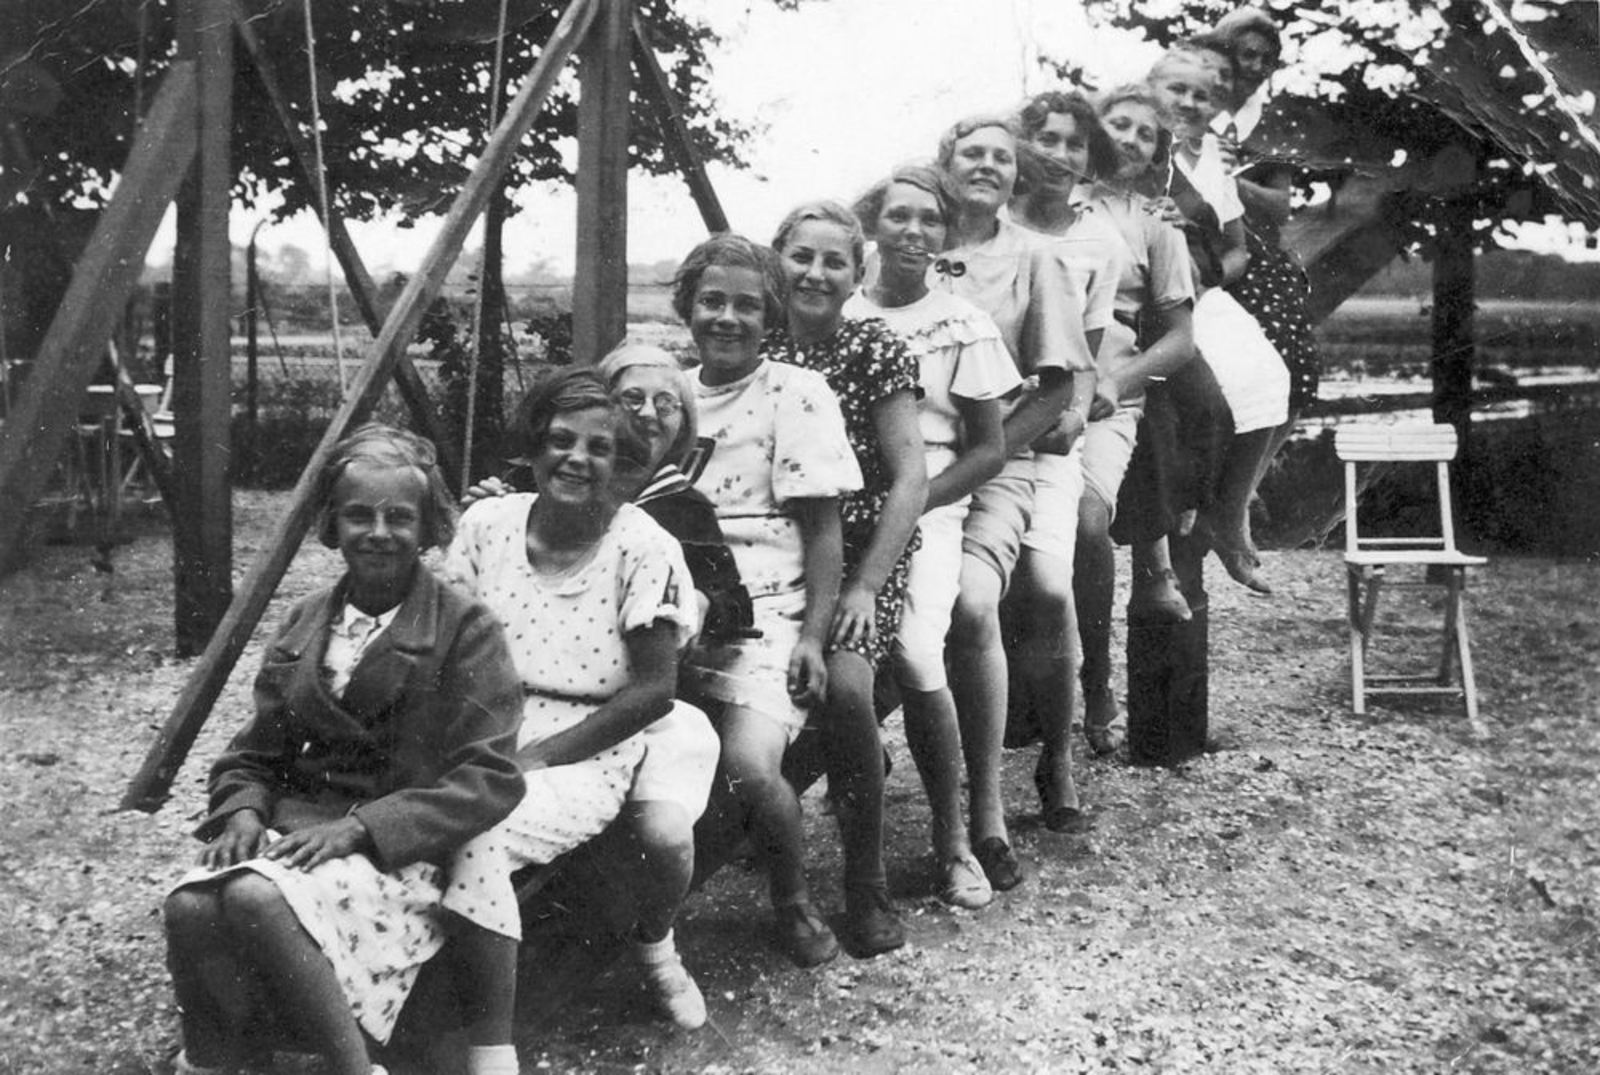 Meisjes Vereniging IJweg Gebouwtje v Brouwer 1935 01